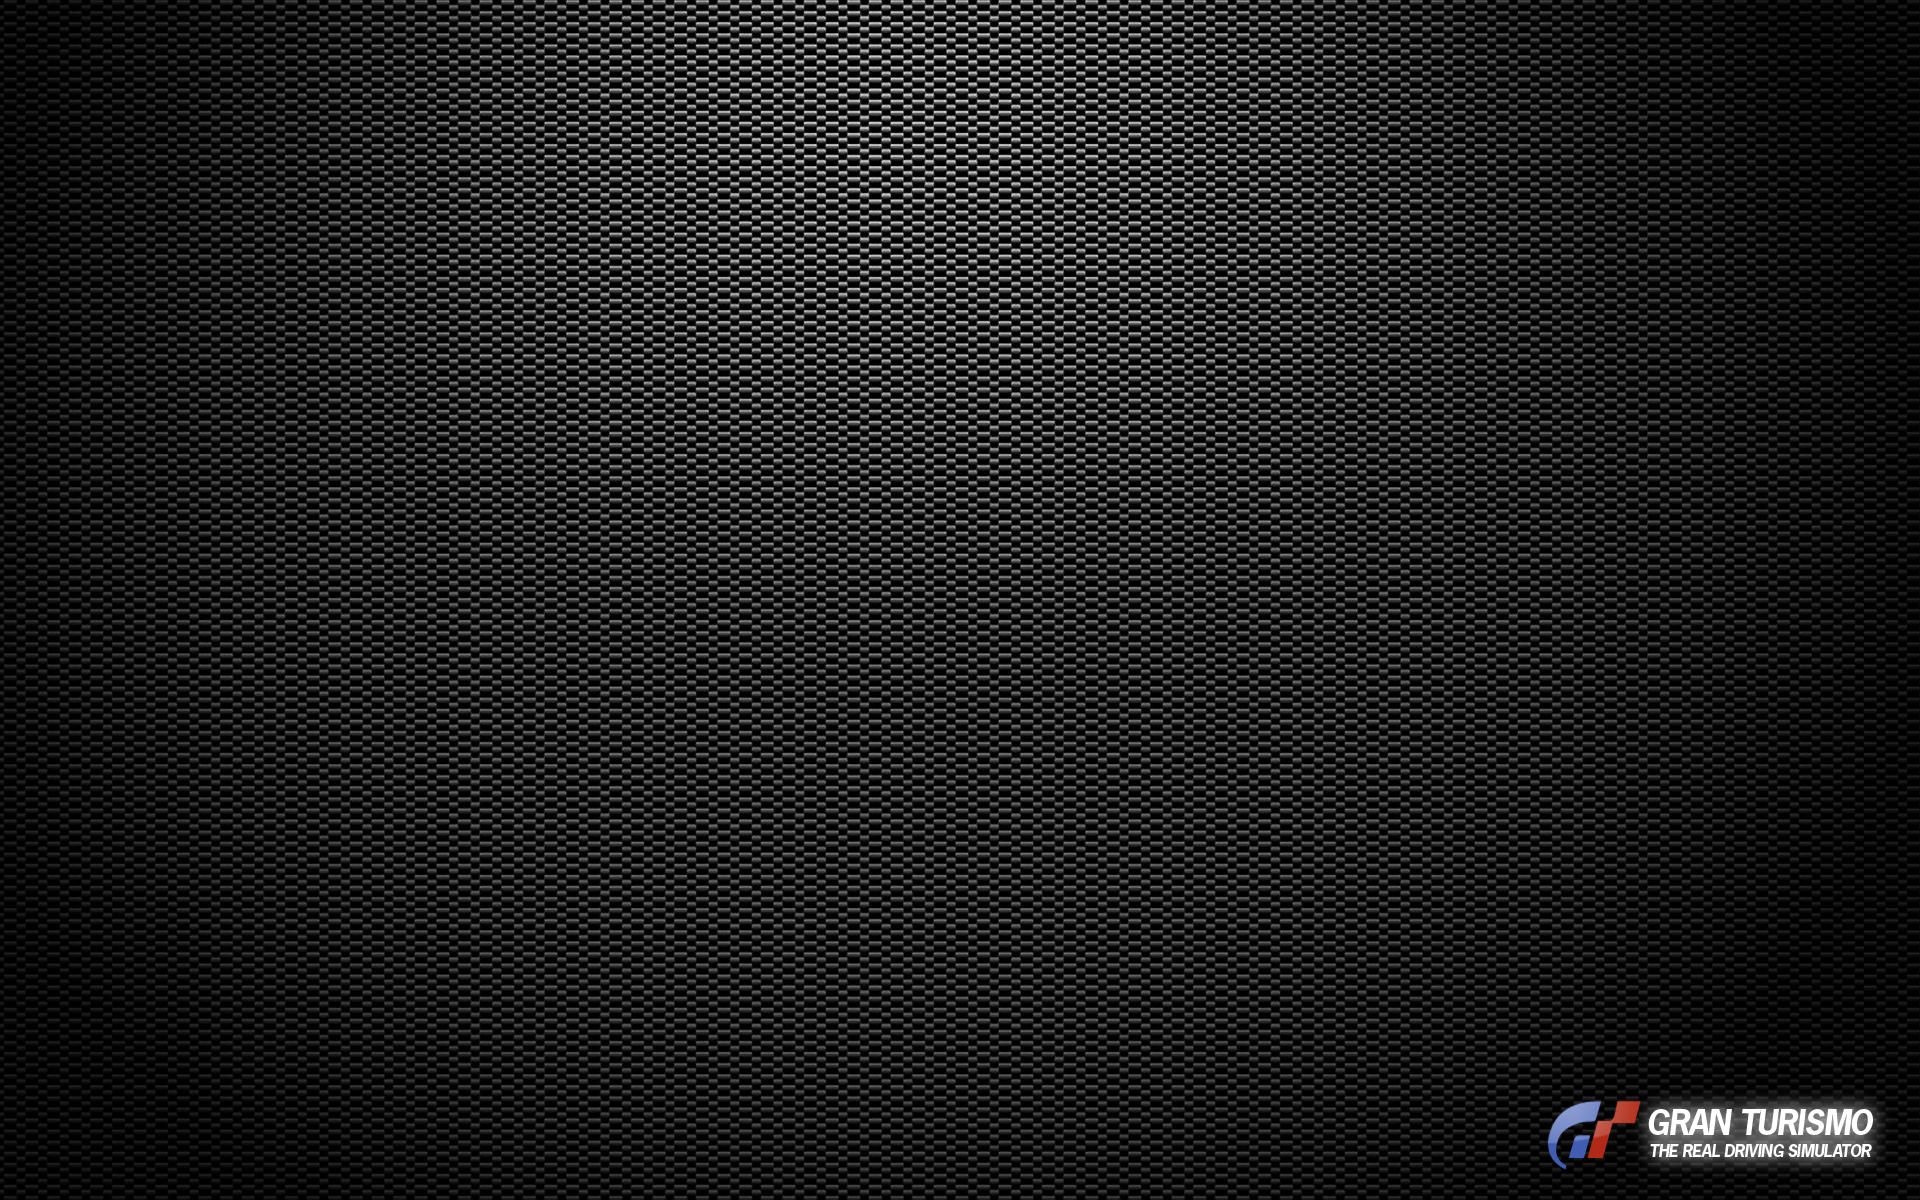 GT4 Wallpaper - Widescreen by deelo